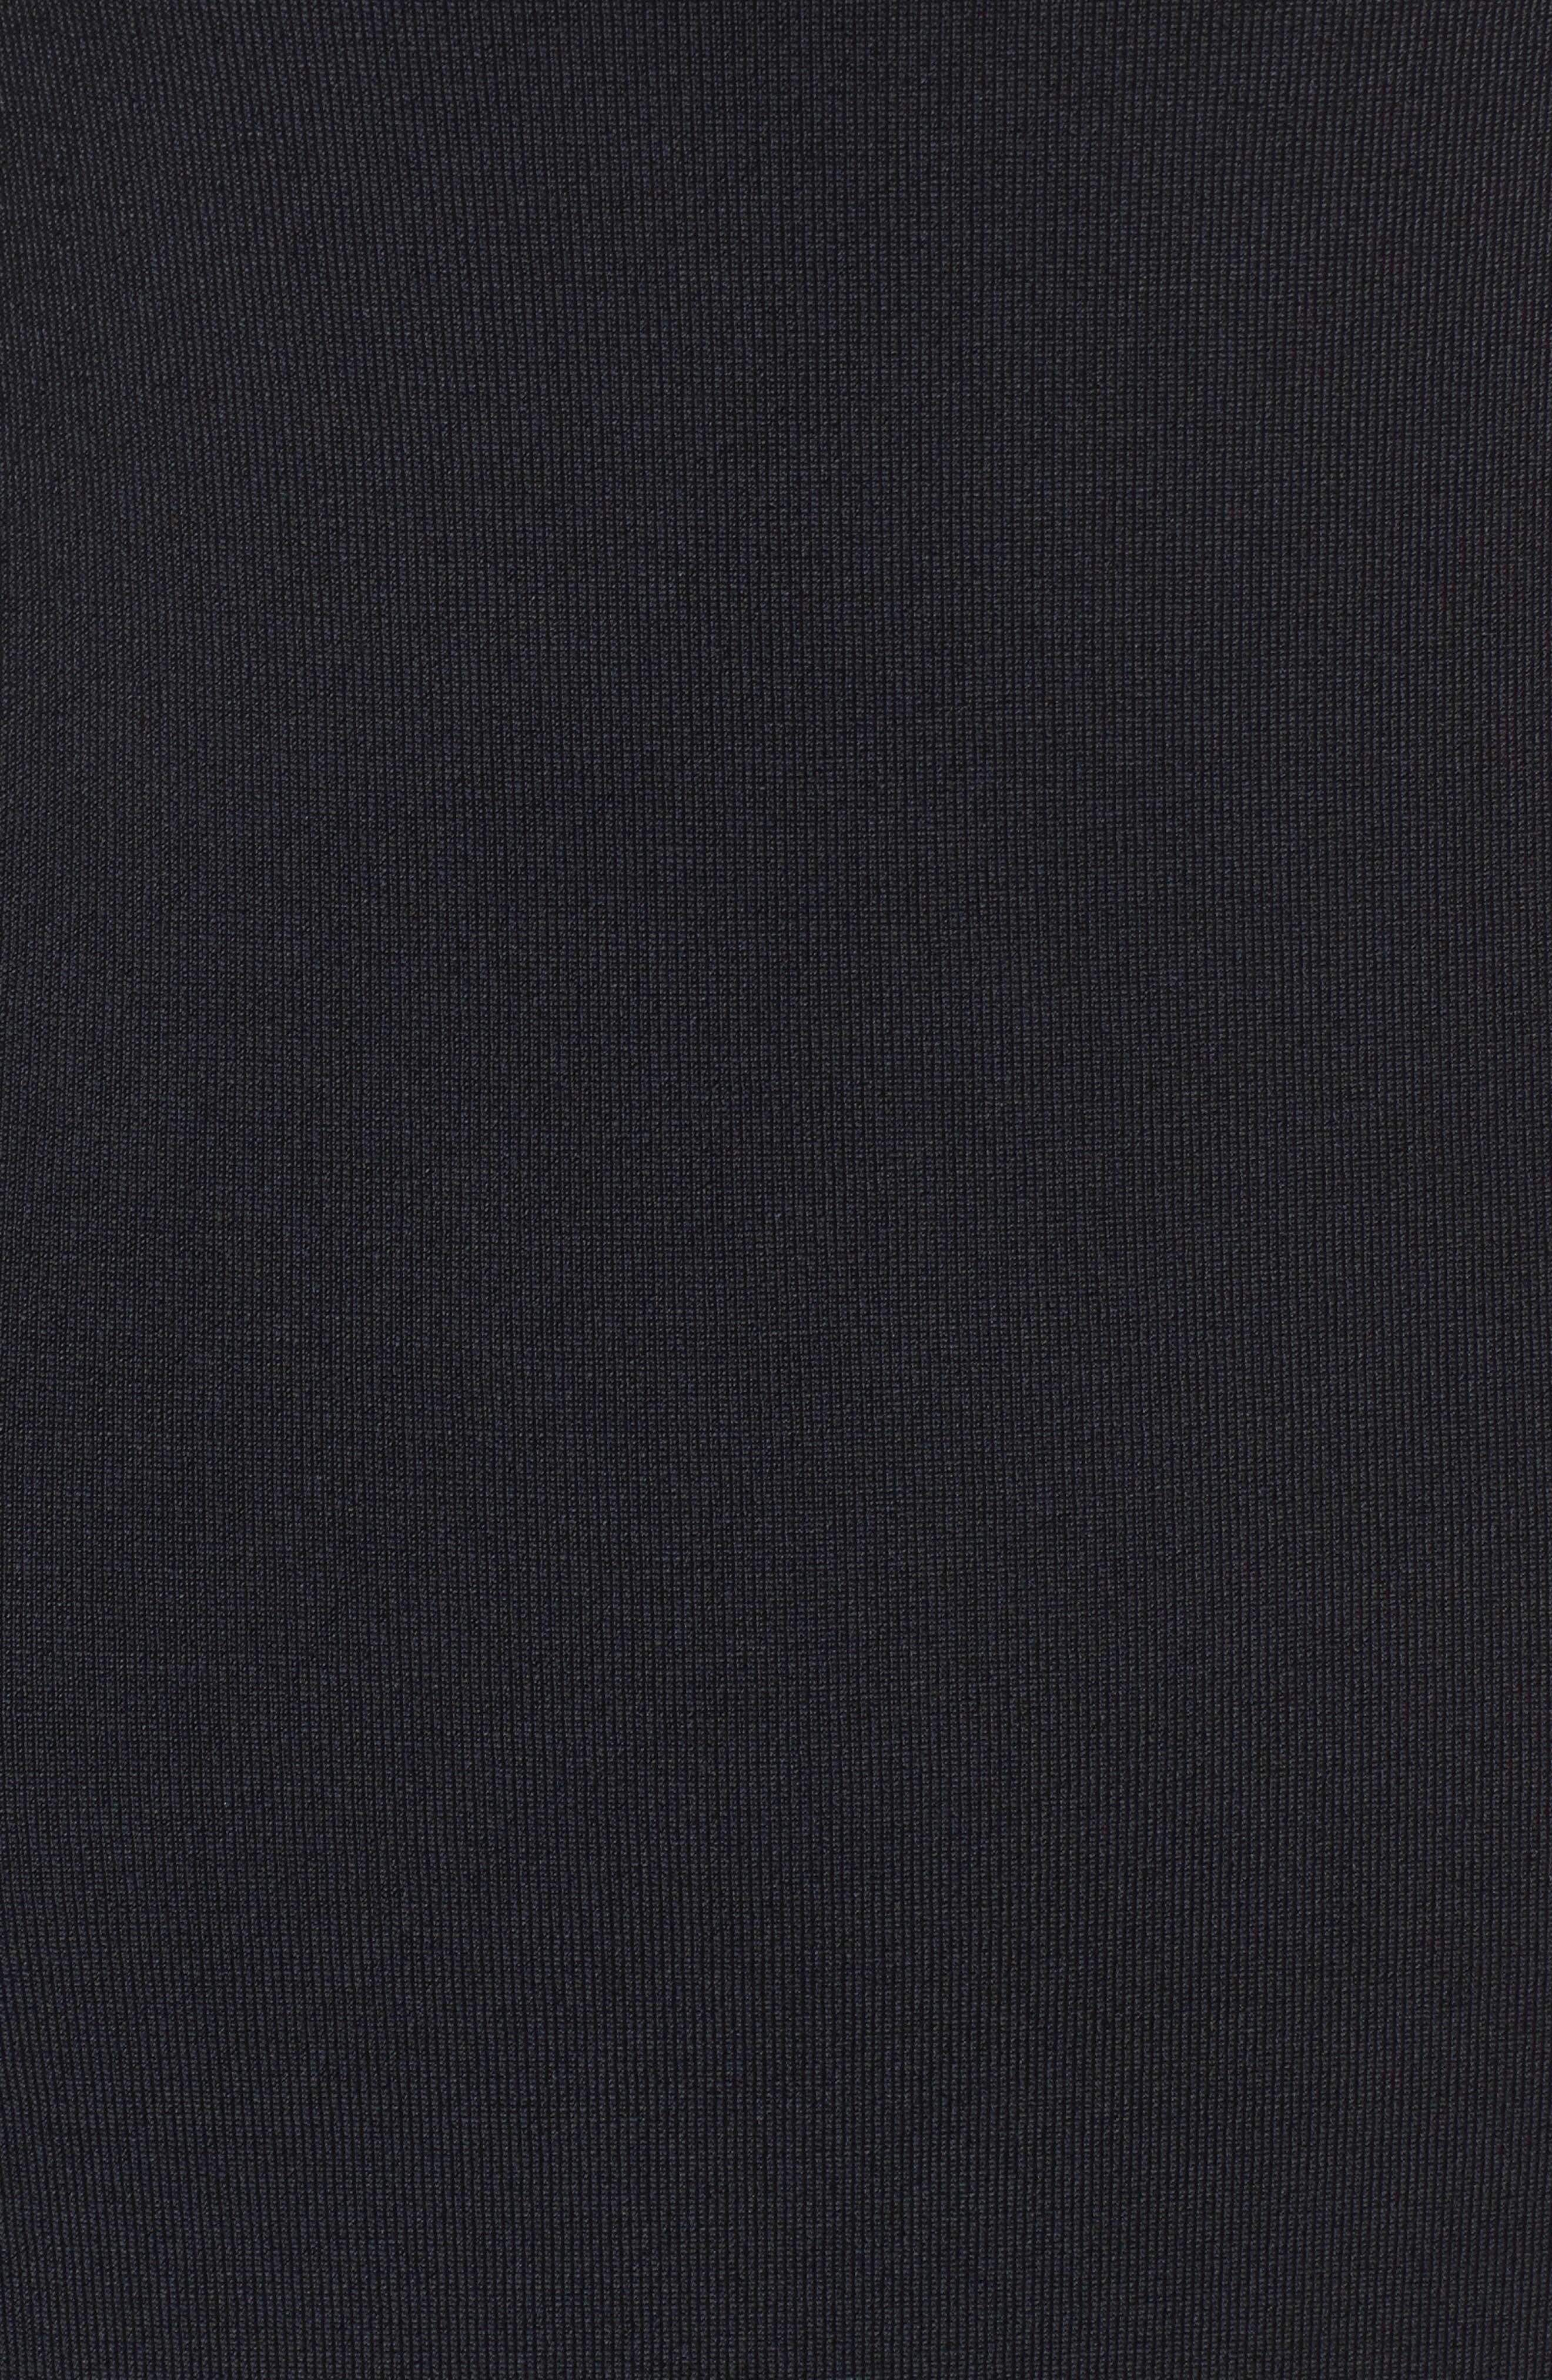 Sleeveless Mock Neck Knit Dress,                             Alternate thumbnail 35, color,